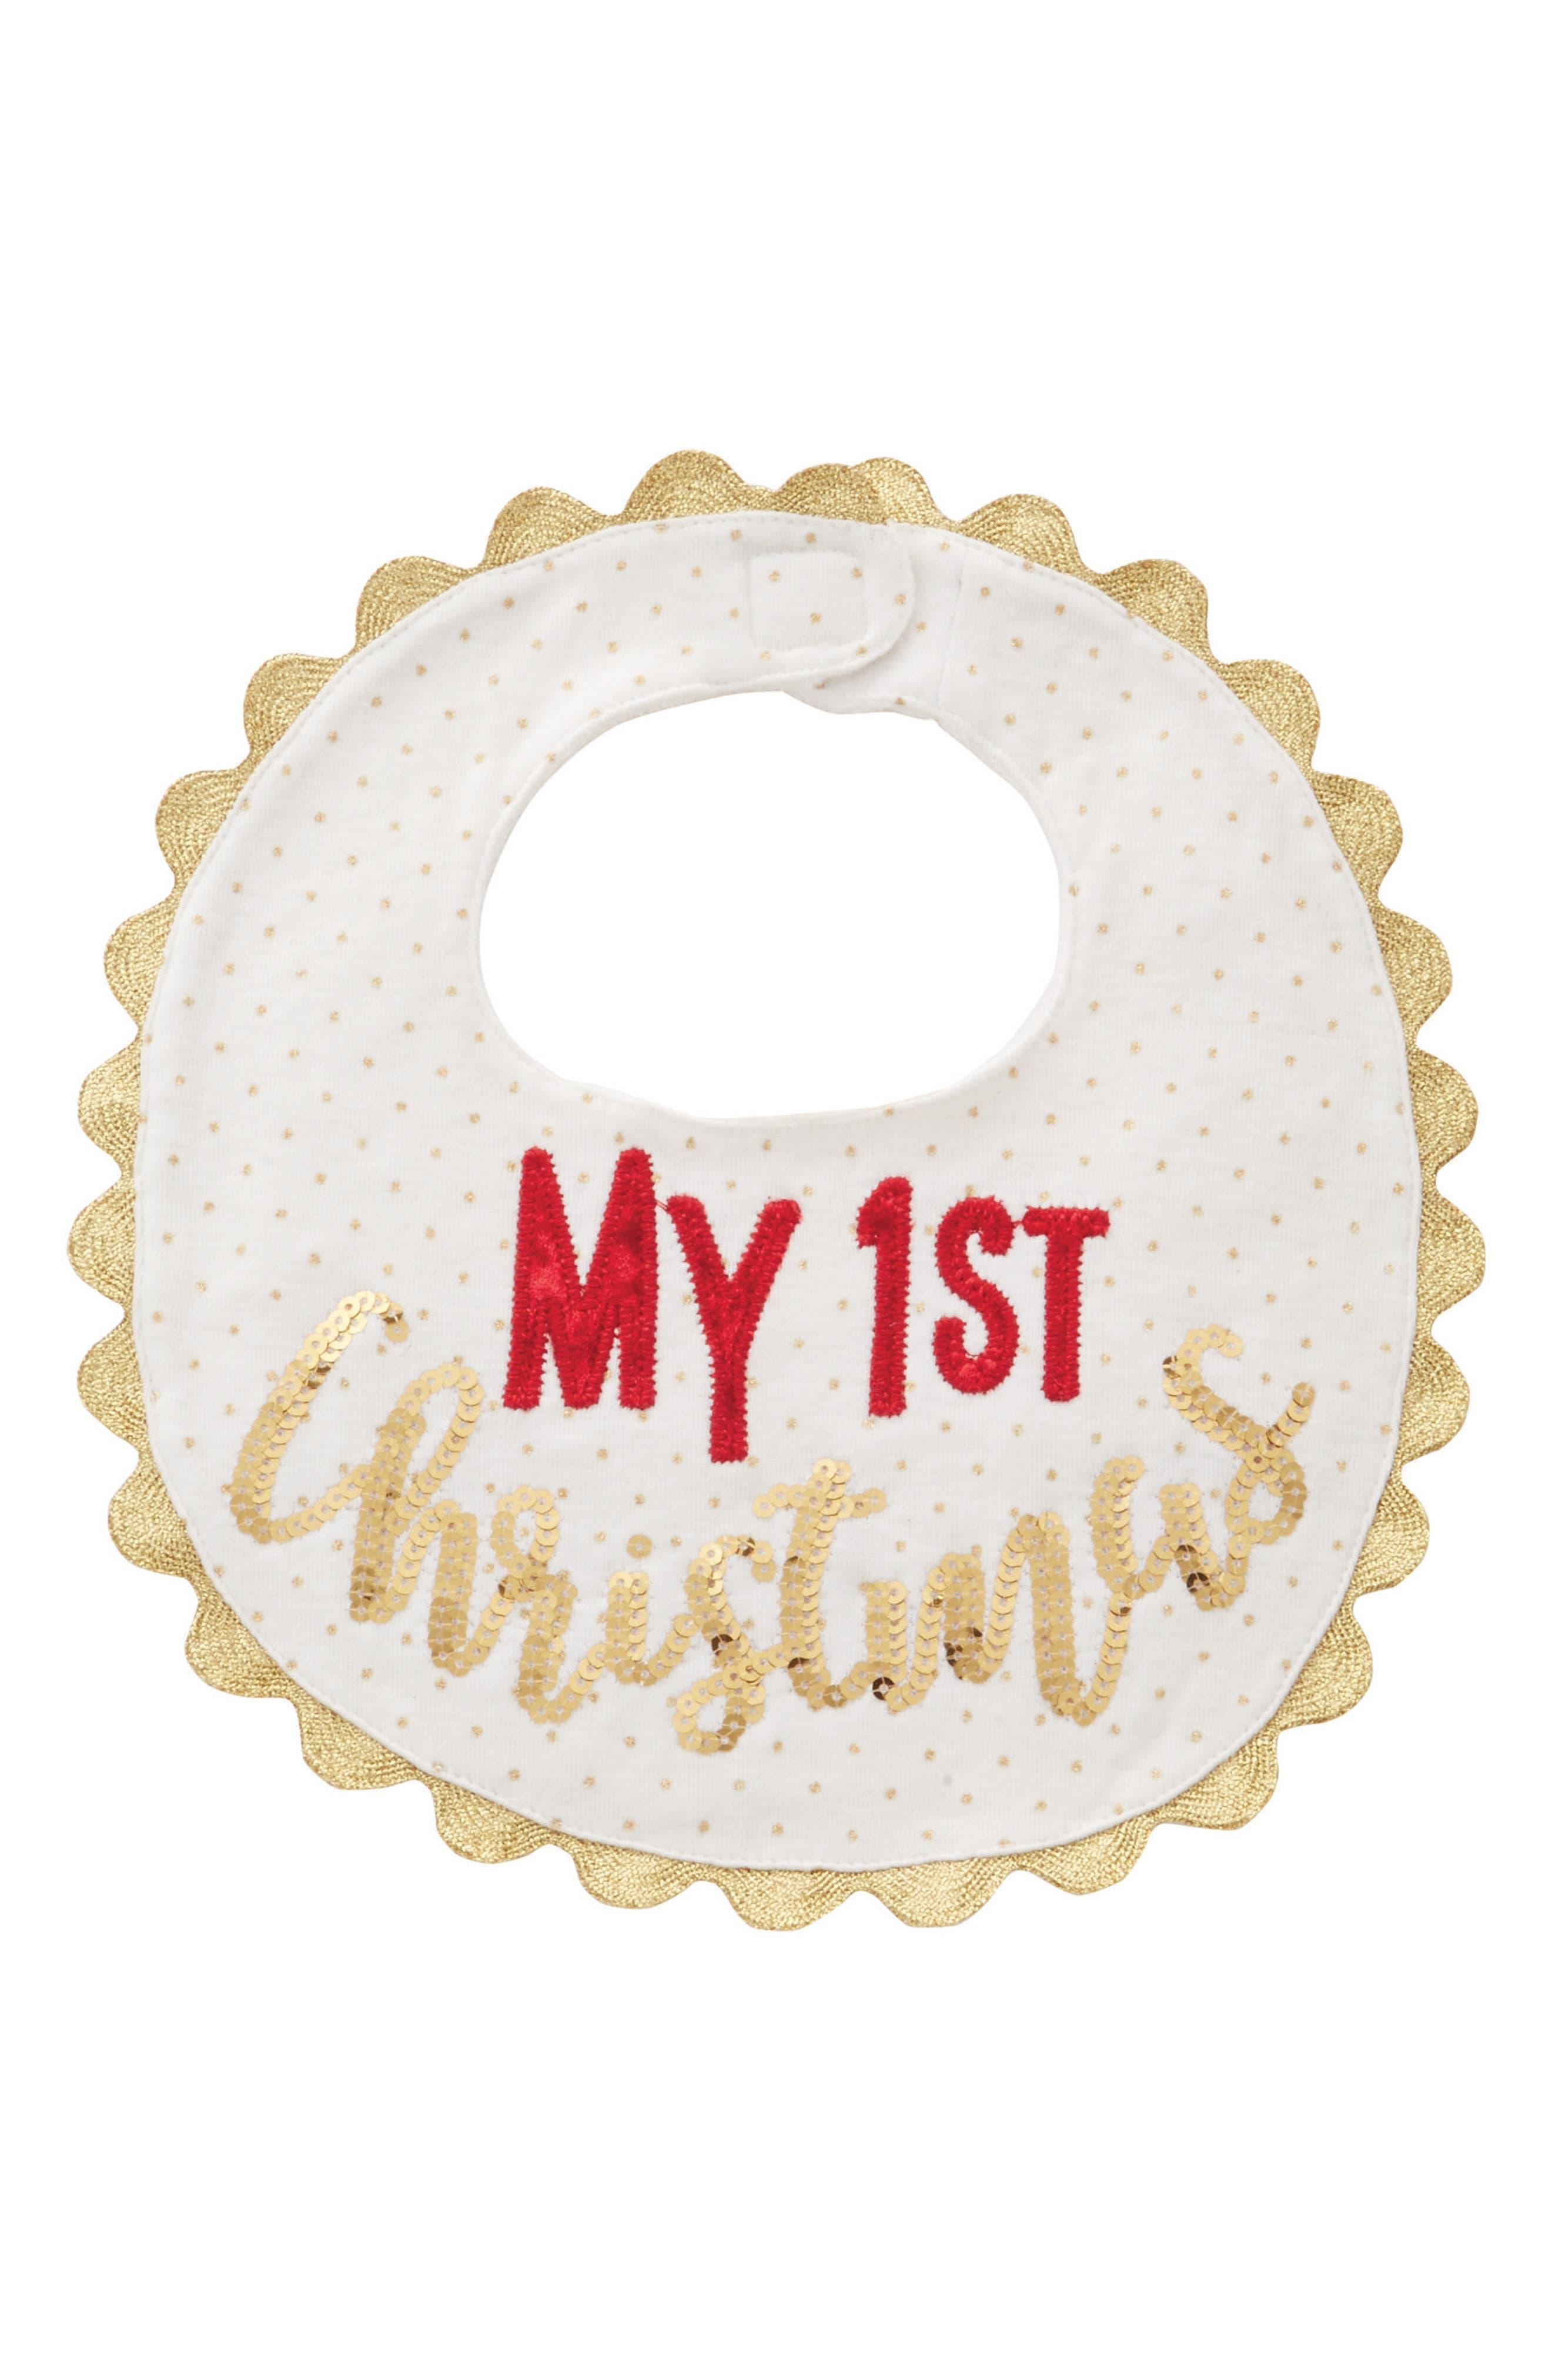 My First Christmas Bib,                             Main thumbnail 1, color,                             710